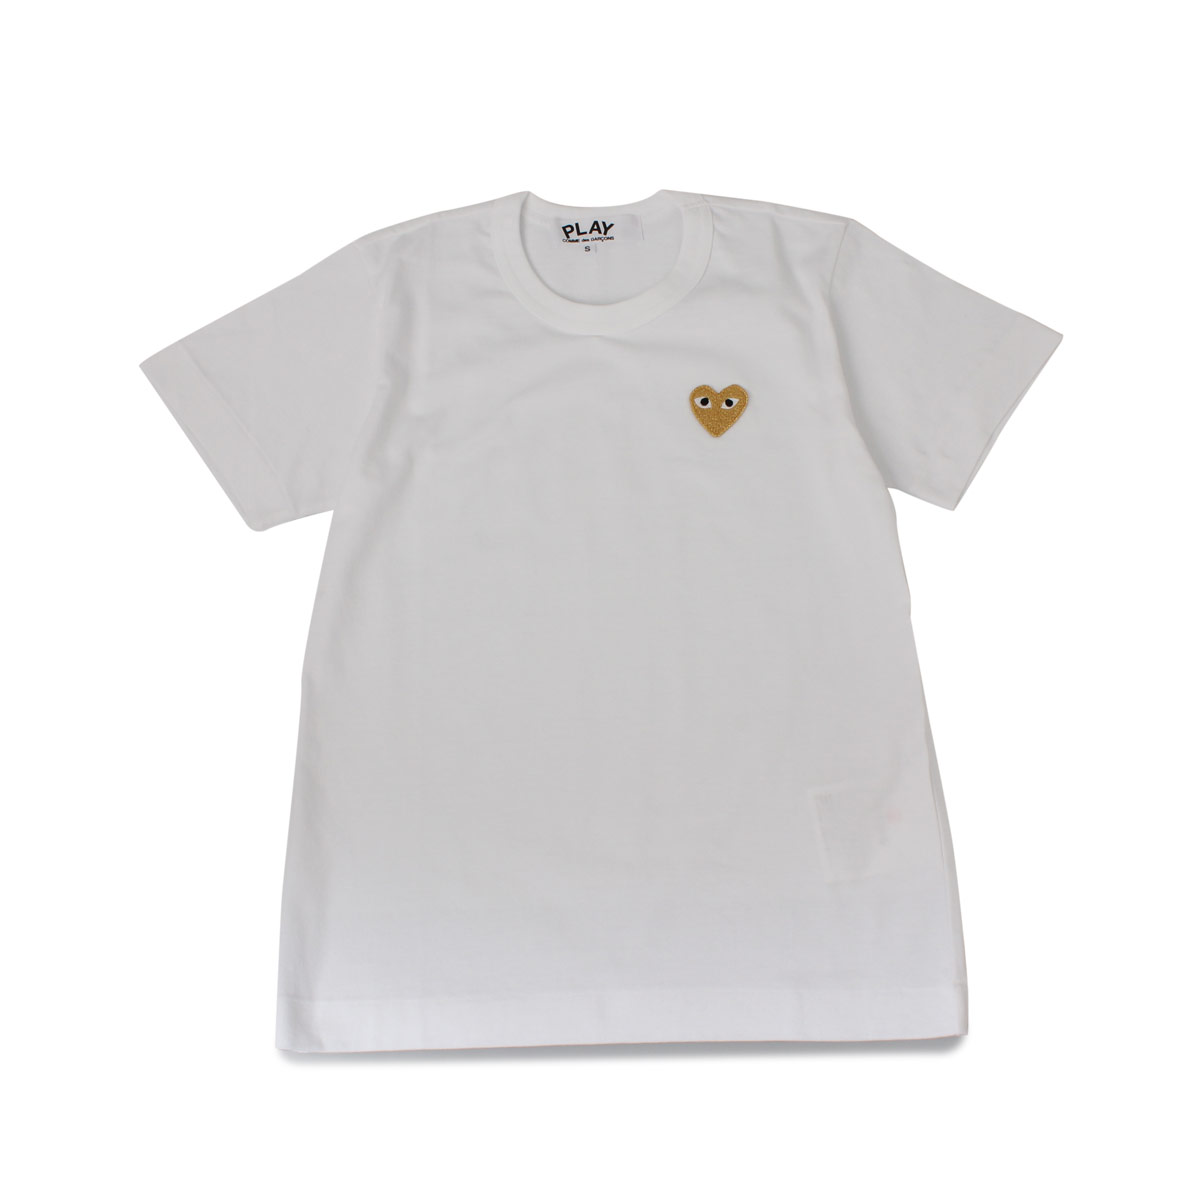 PLAY COMME des GARCONS BASIC LOGO TEE プレイ コムデギャルソン Tシャツ 半袖 レディース ホワイト 白 T2150514